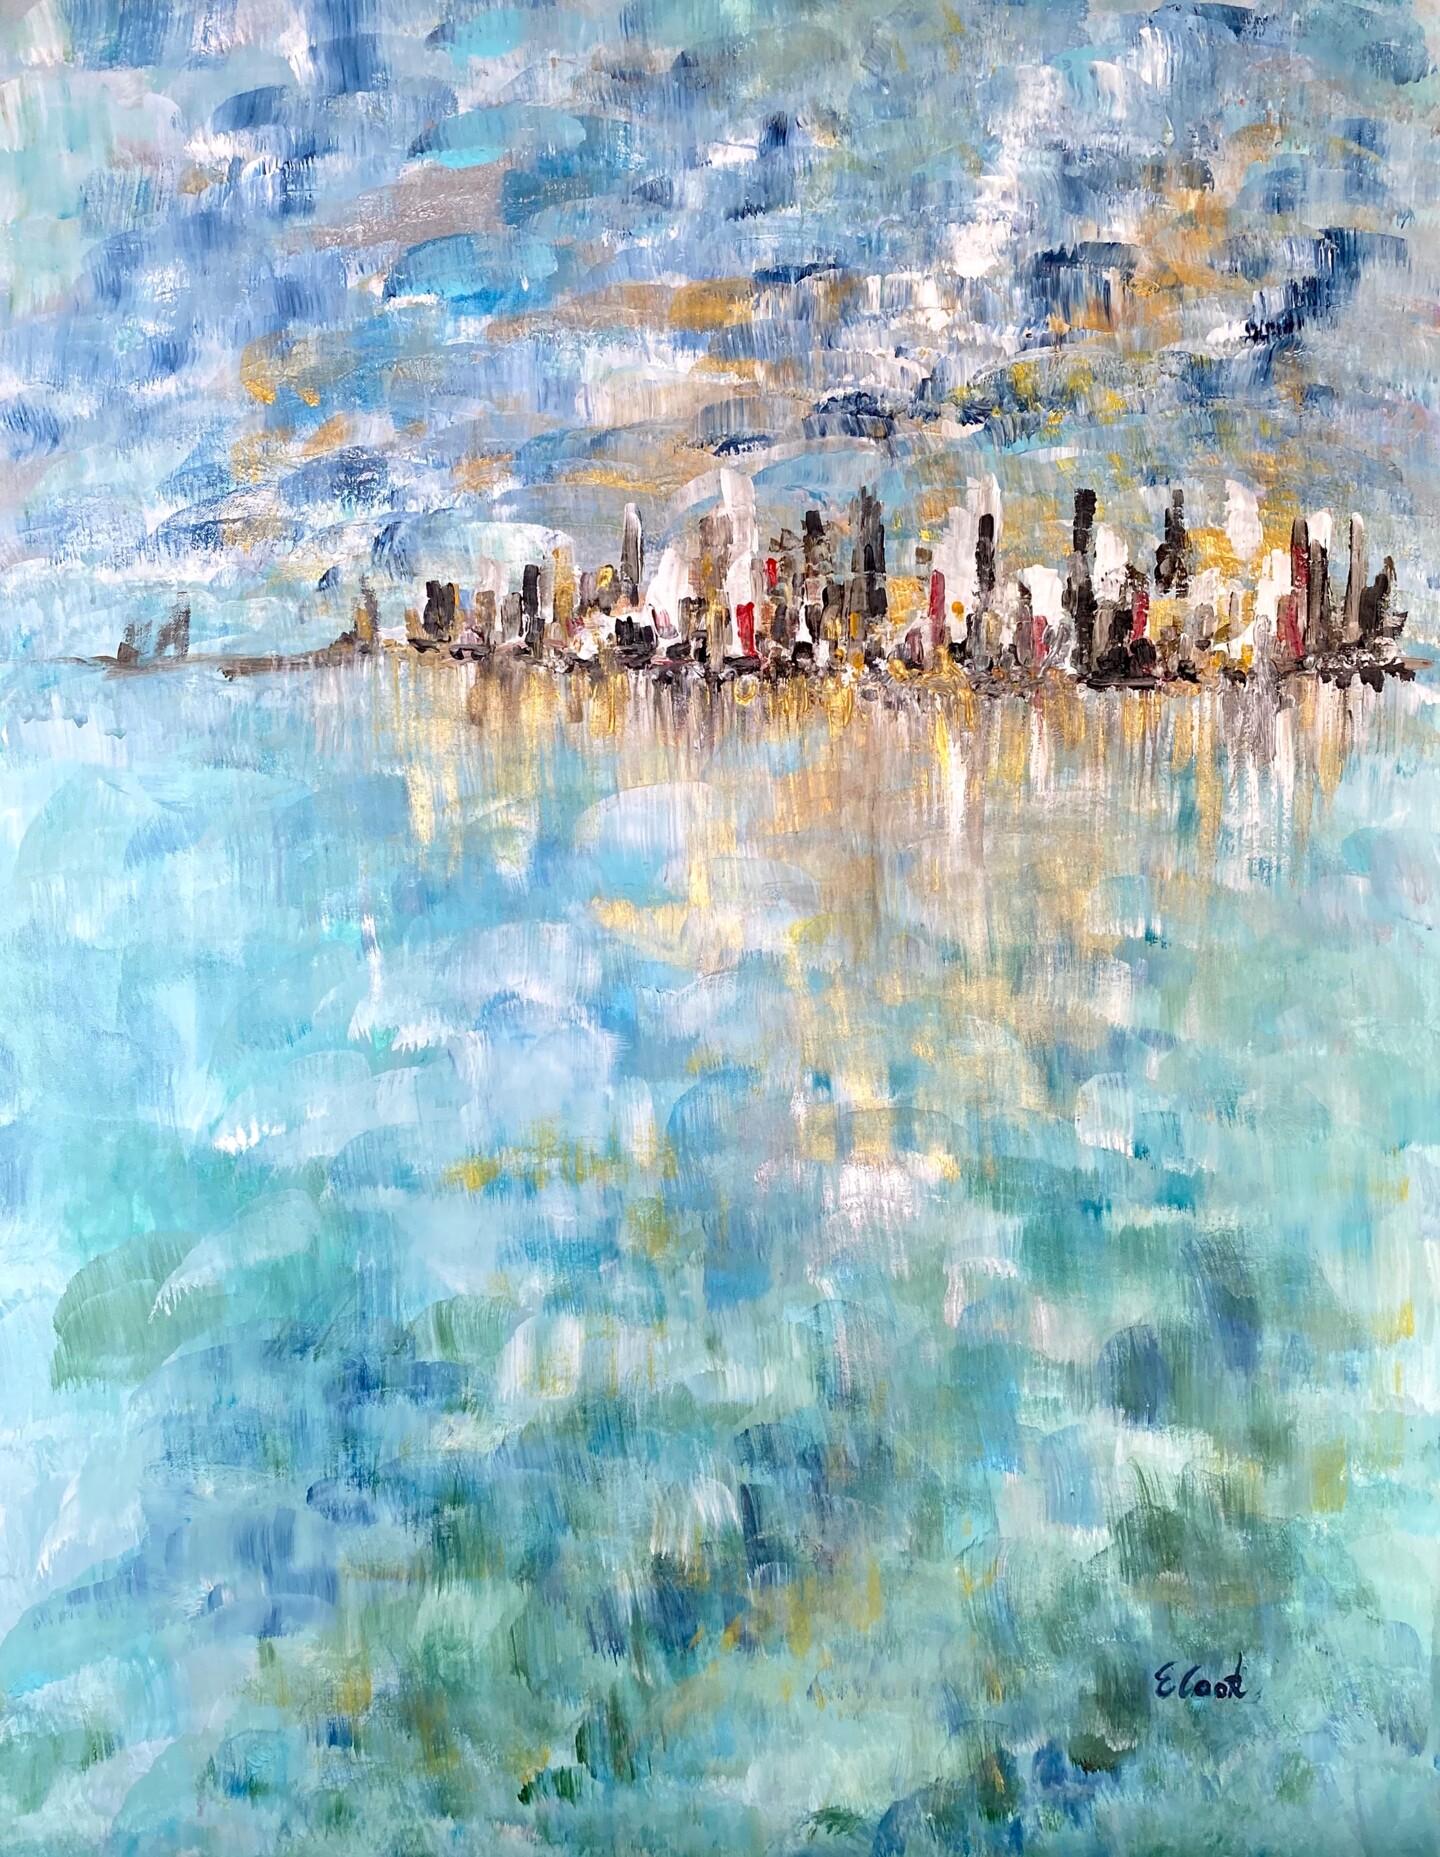 Elisa Cook - Blue Mosaic